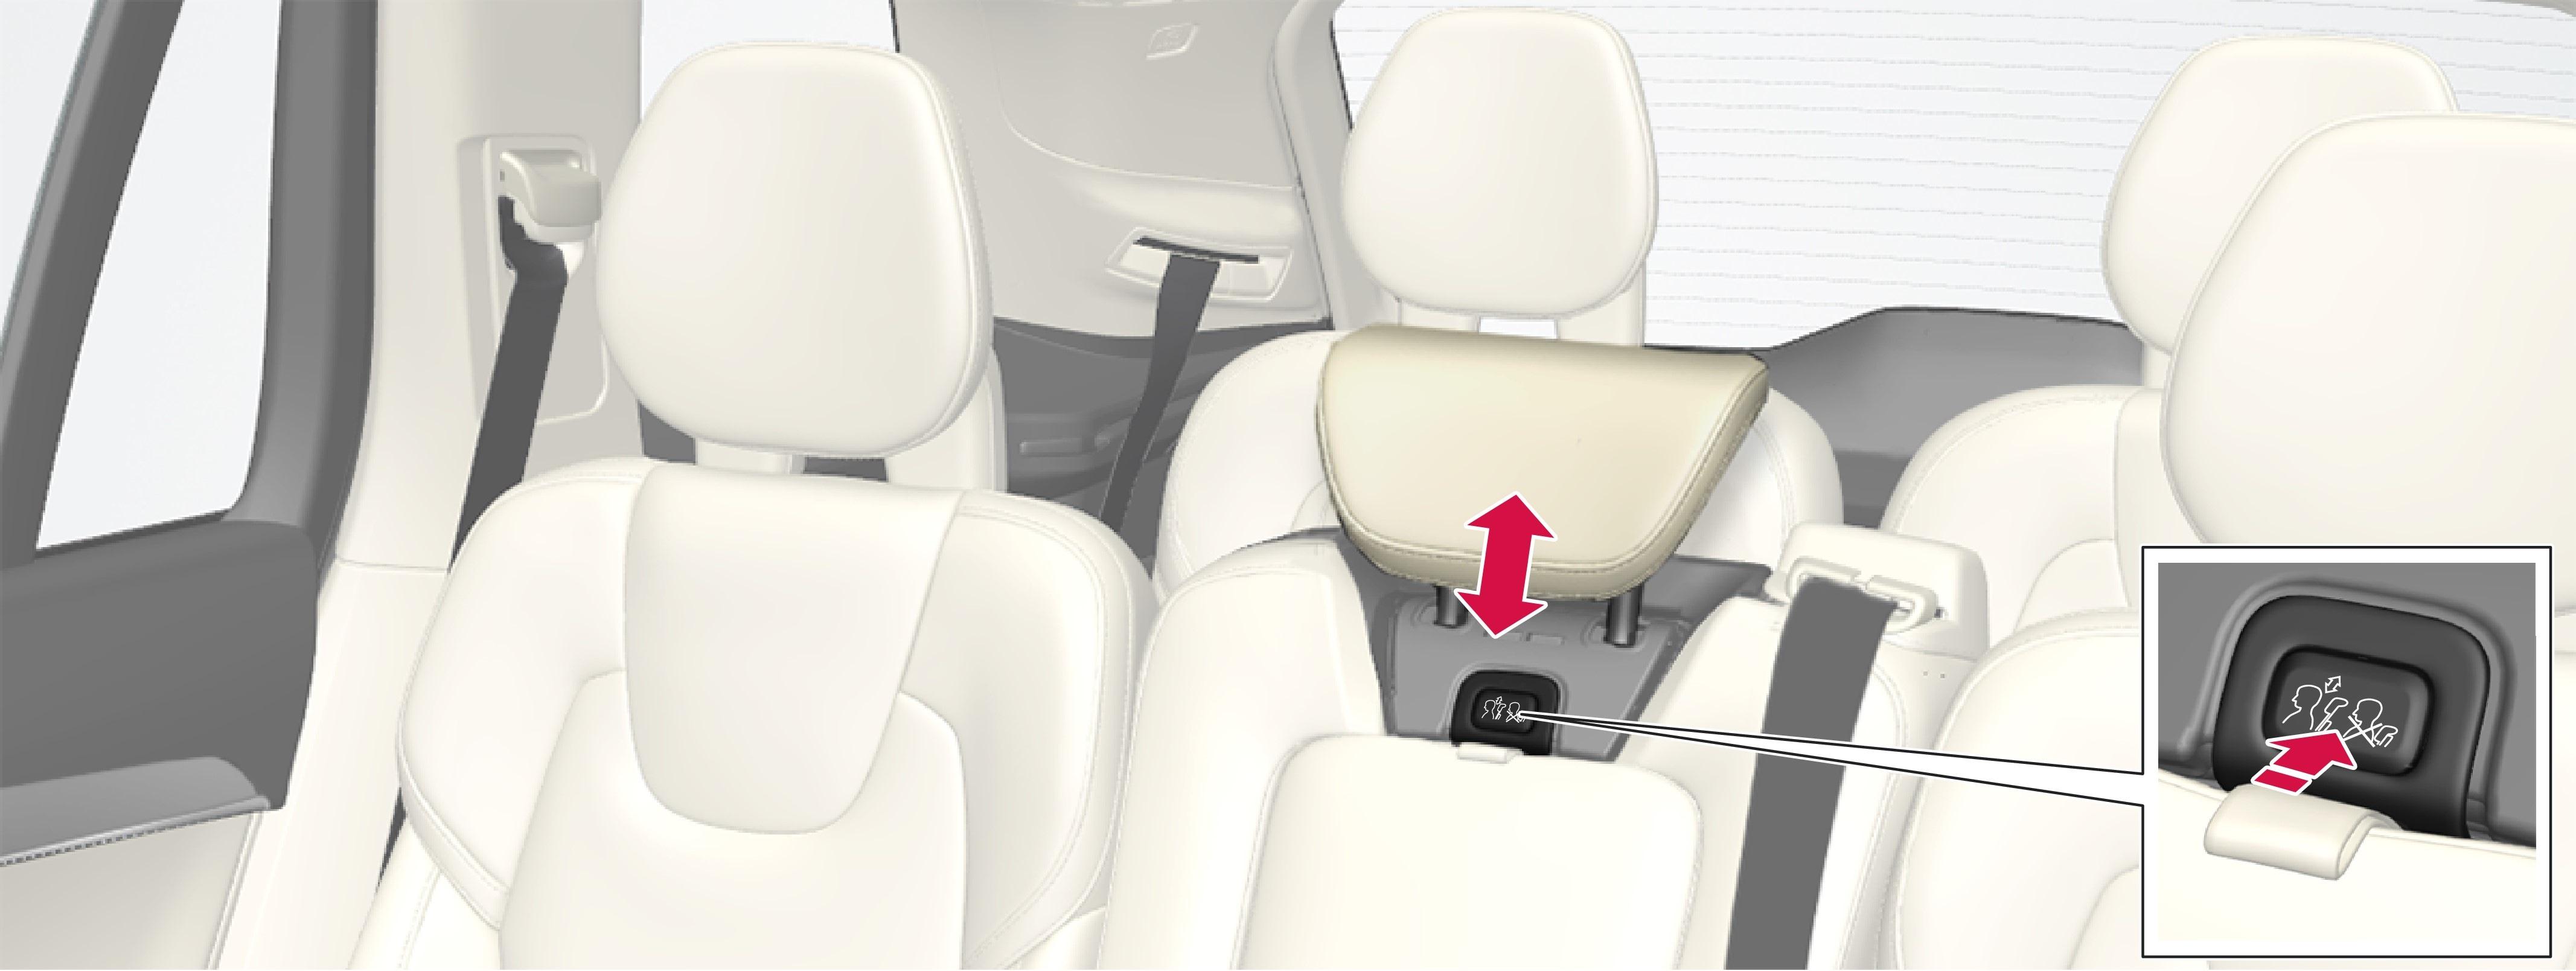 P5-1507-2nd seat row-Adjust headrest center back